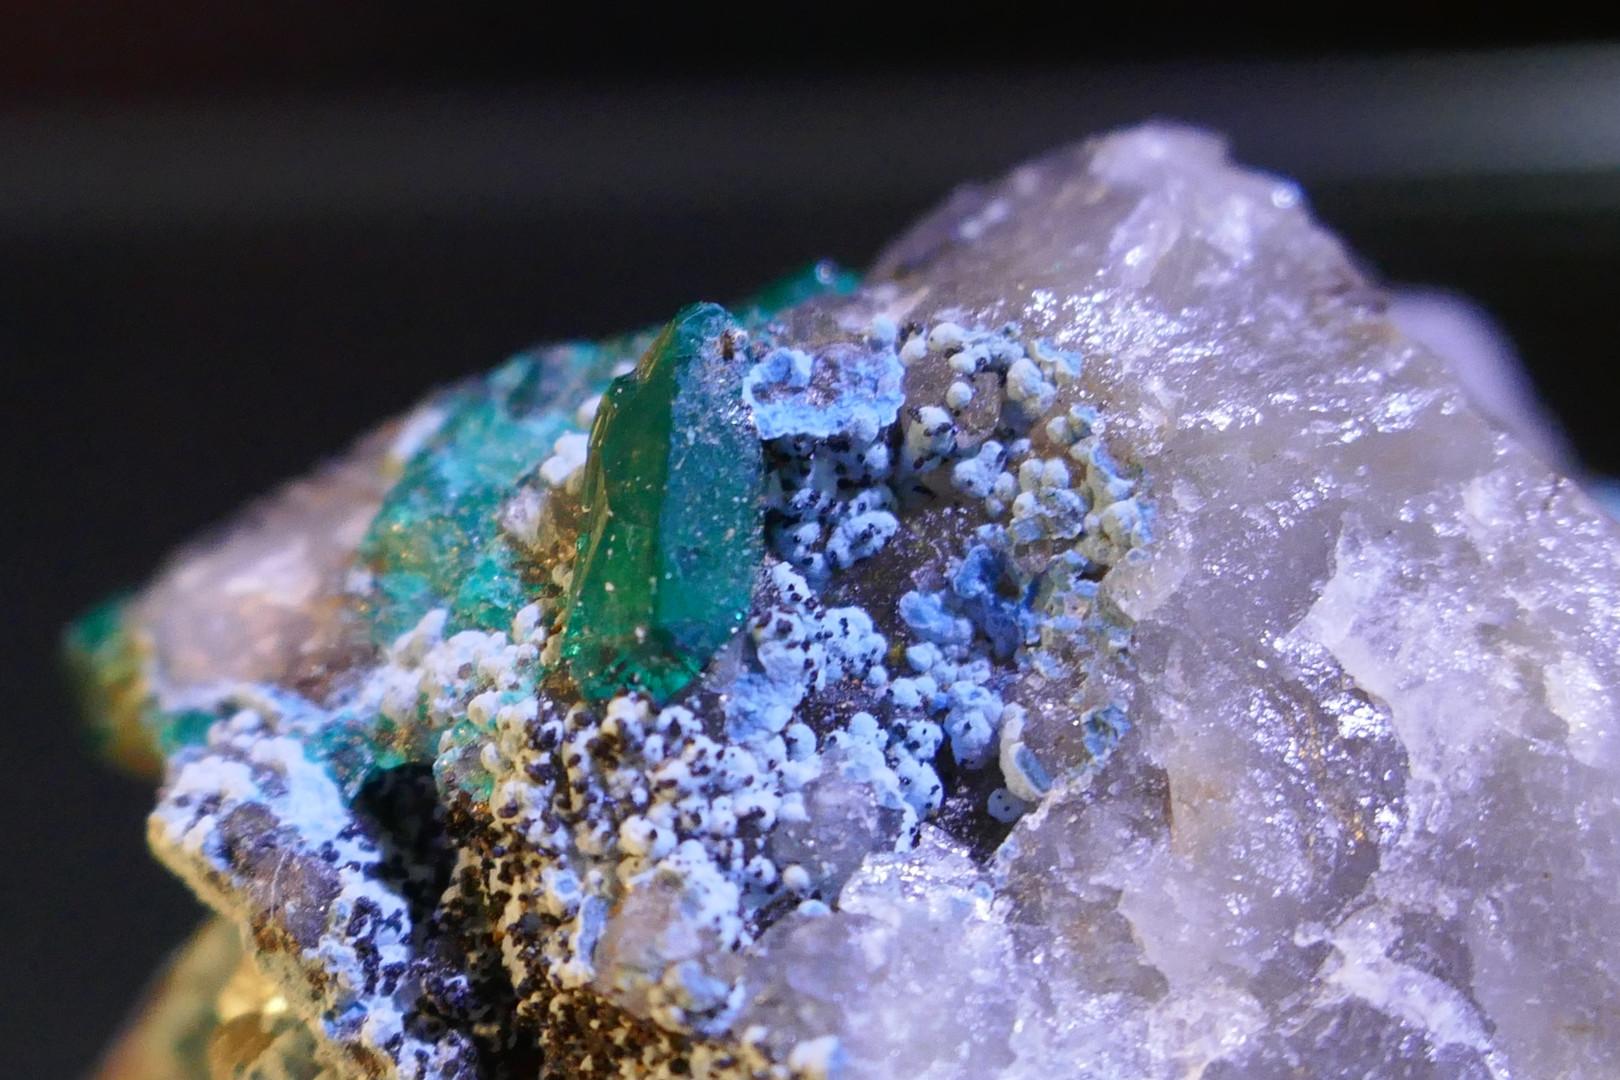 Several gemmy translucent Dioptase crystals scattered between Shattuckite andPlanchite on Quartz